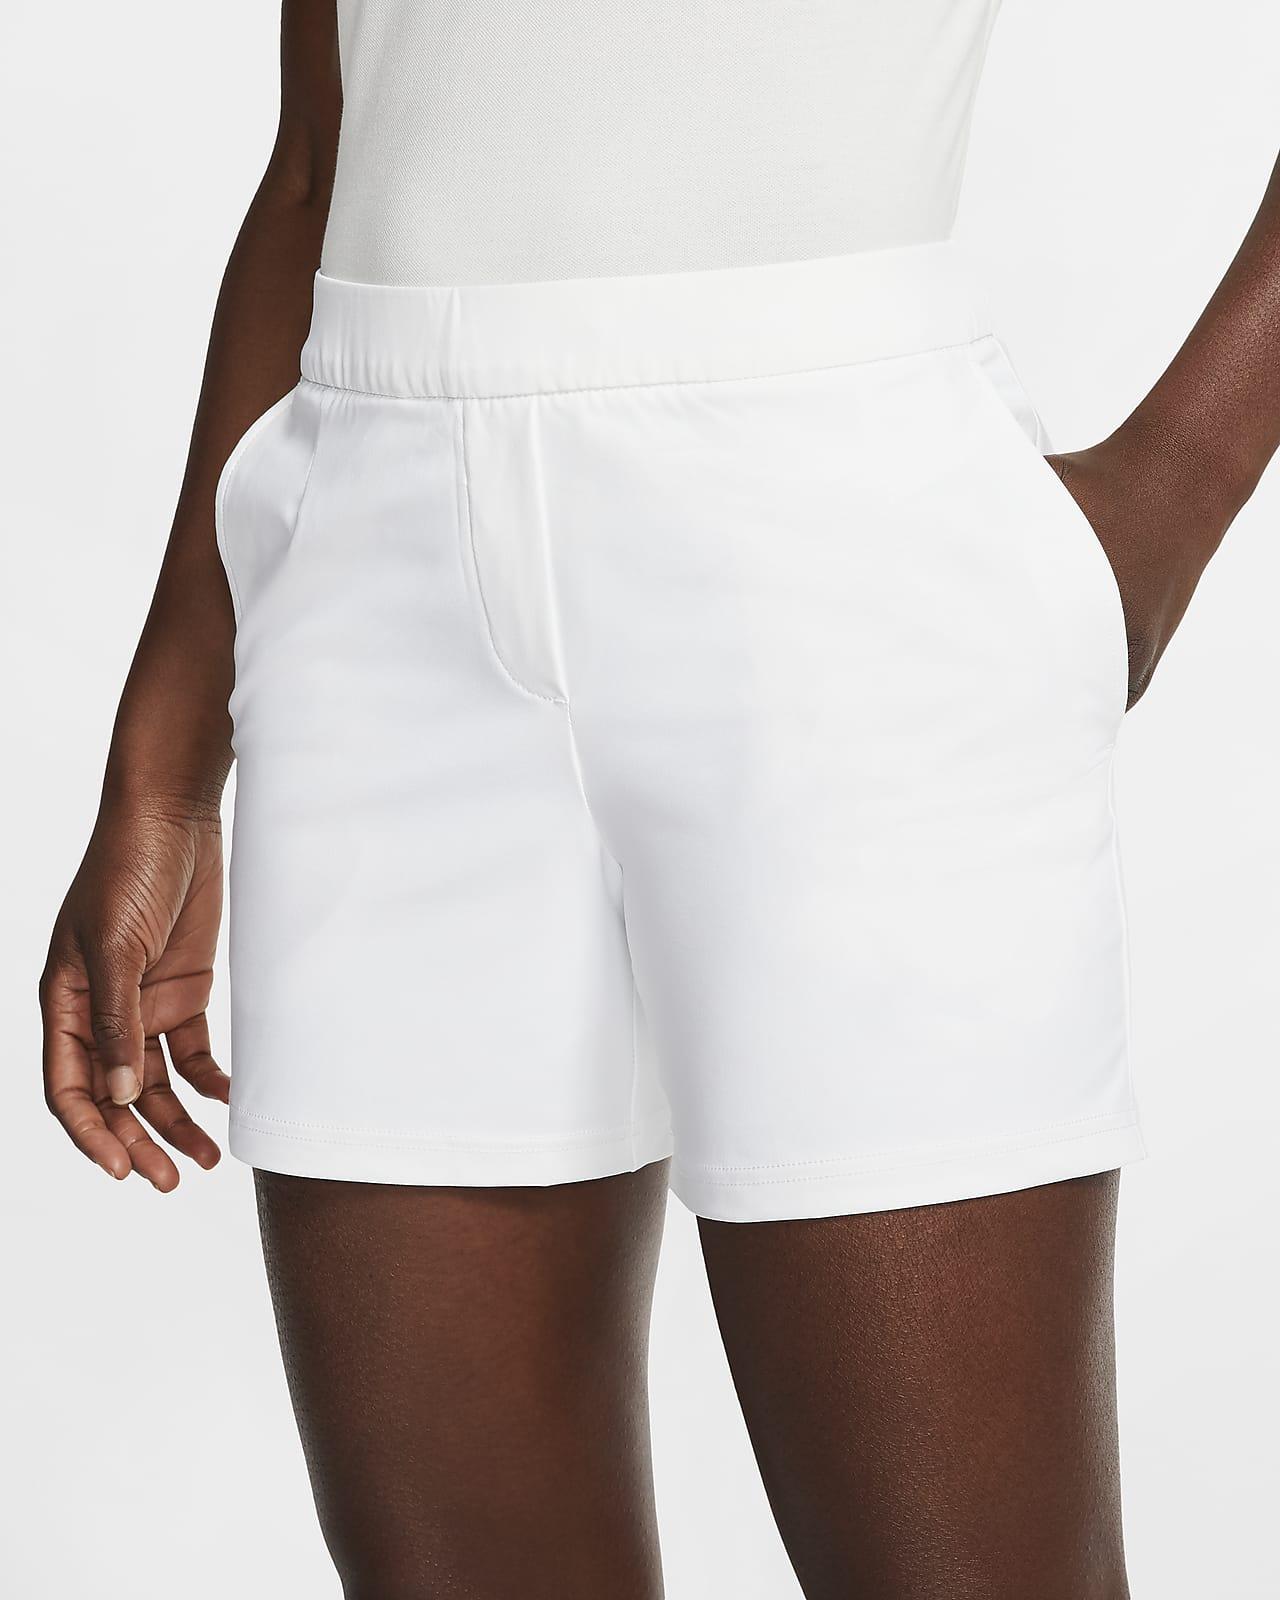 Shorts de golf de 13 cm para mujer Nike Flex Victory